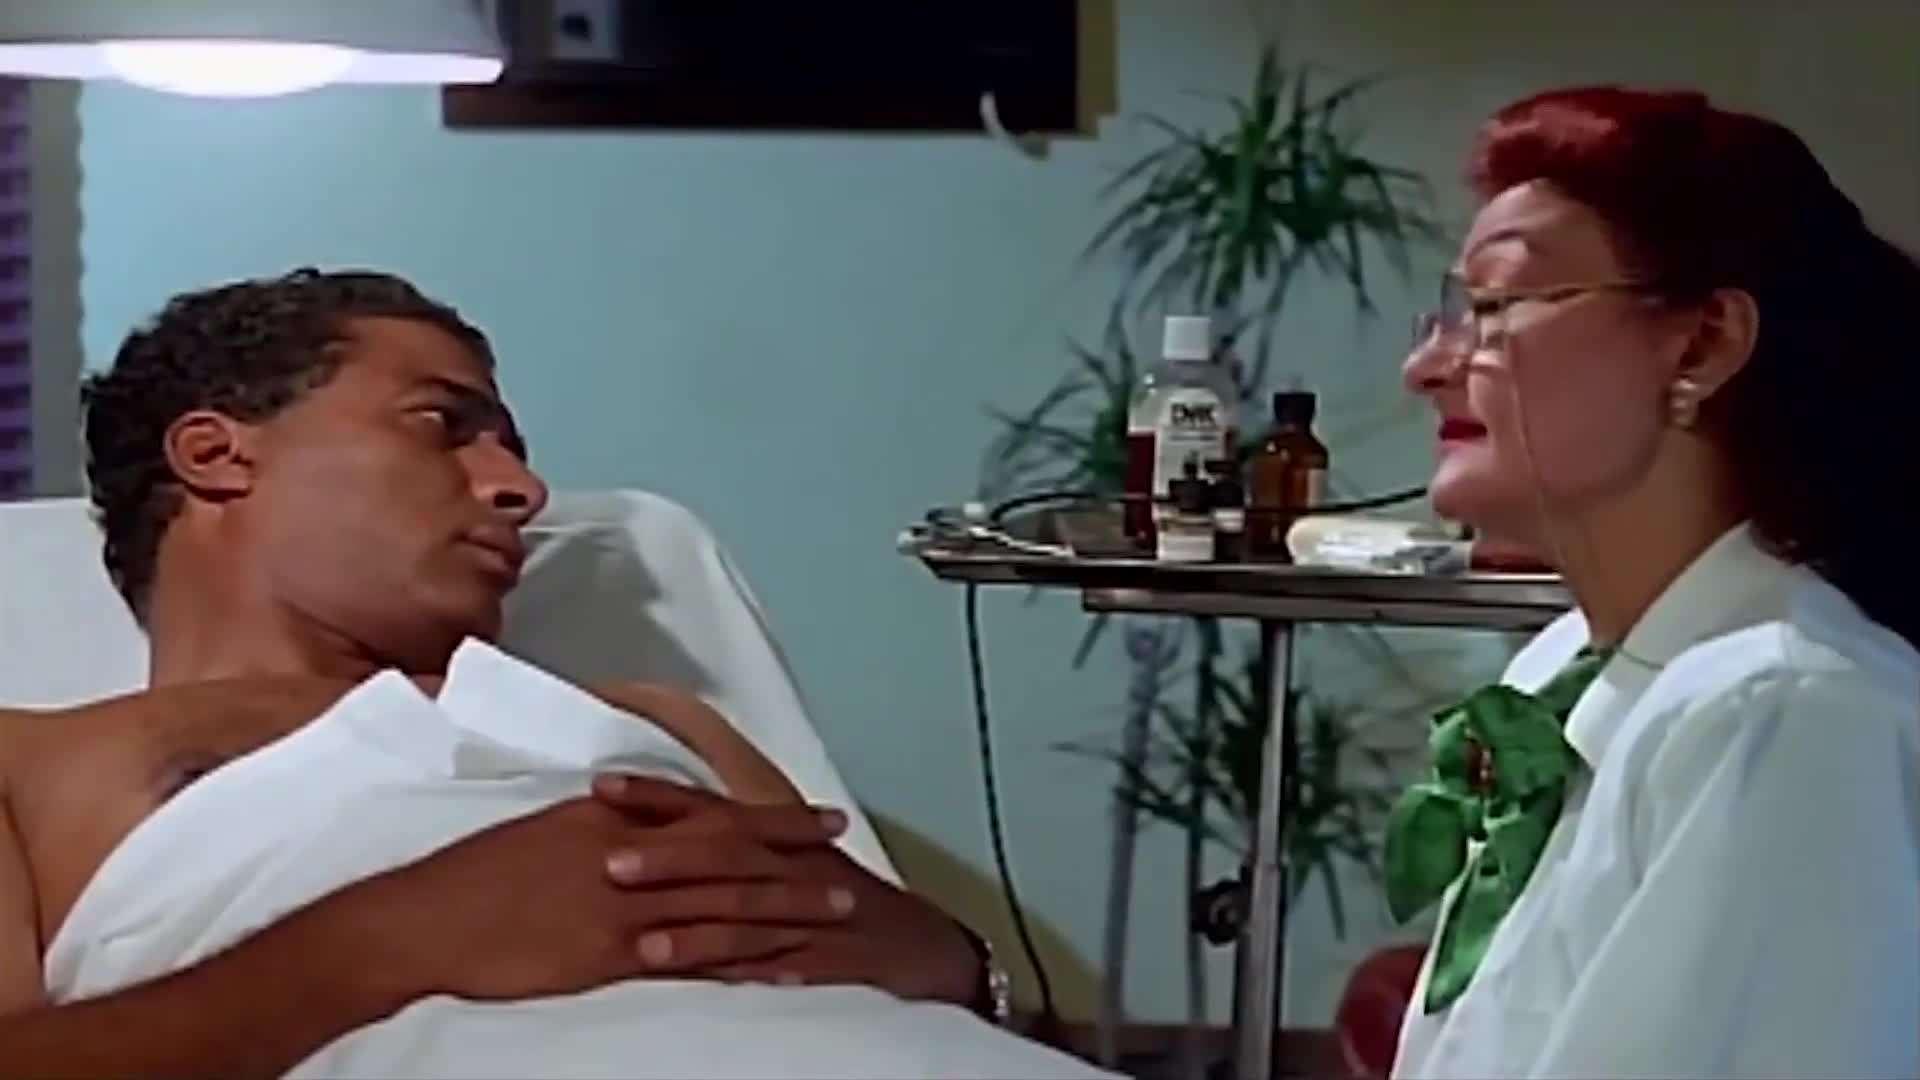 [فيلم][تورنت][تحميل][استاكوزا][1996][1080p][Web-DL] 12 arabp2p.com